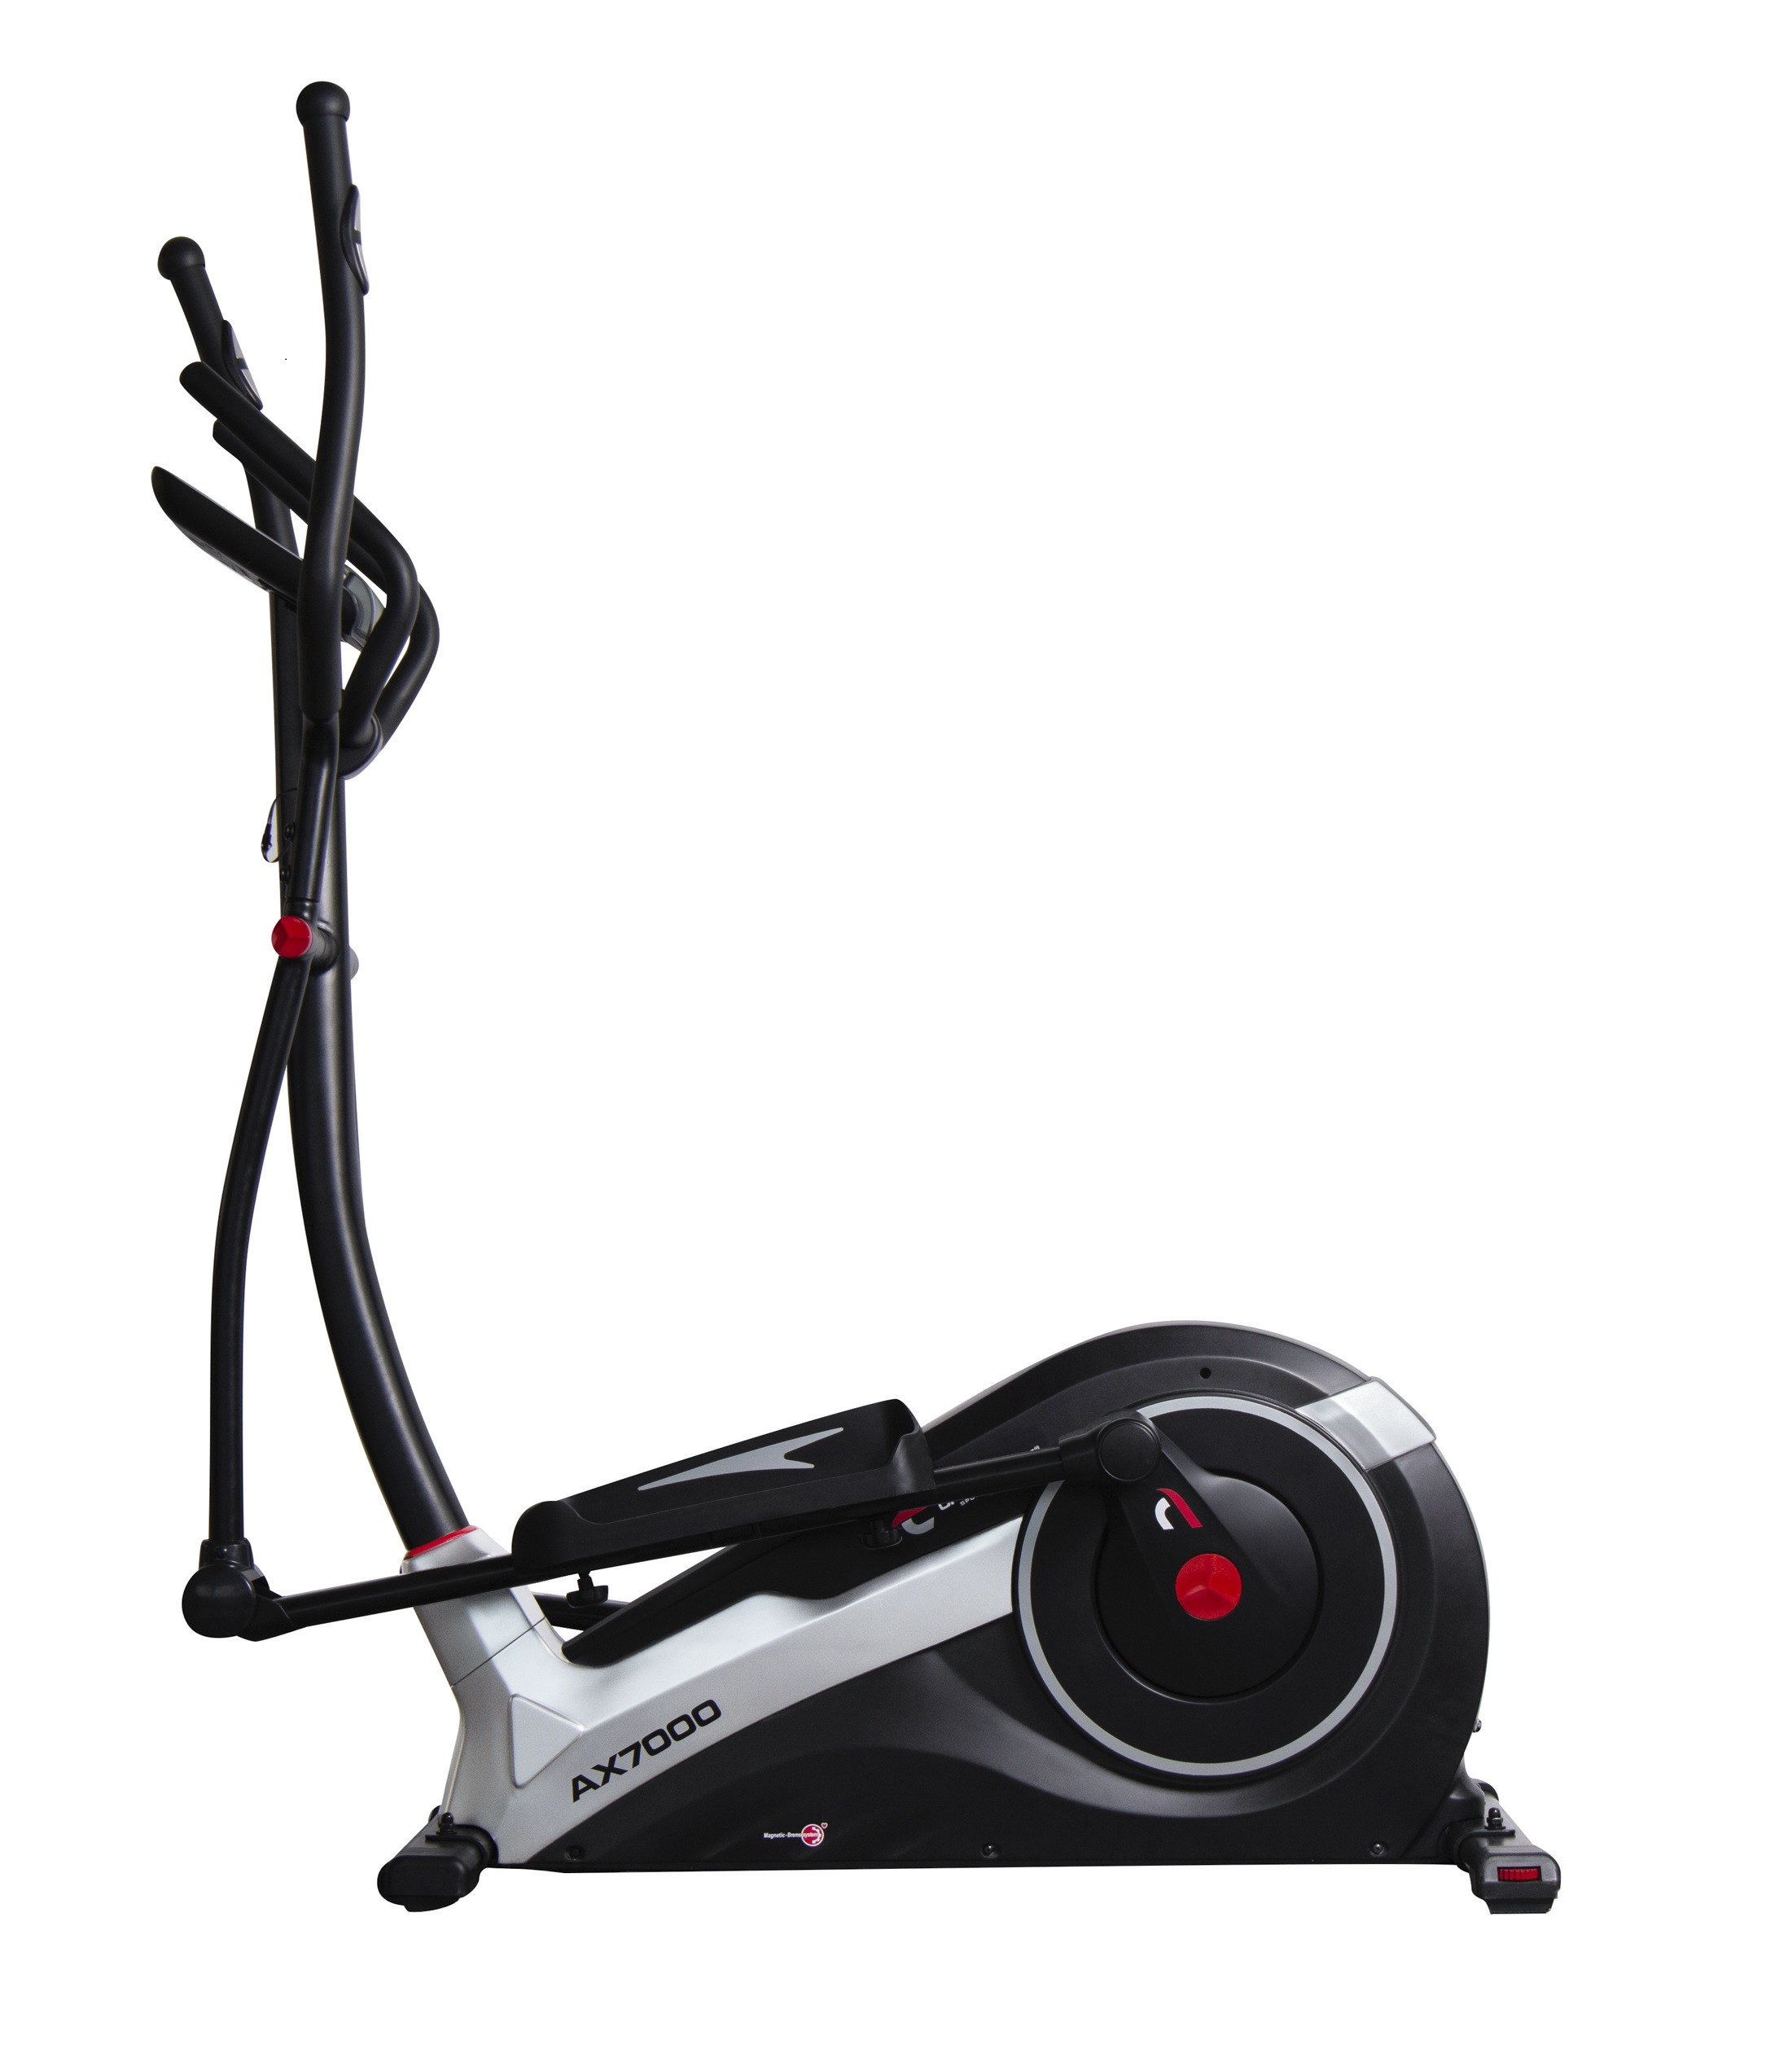 Crosstrainer-Ergometer AX 7000